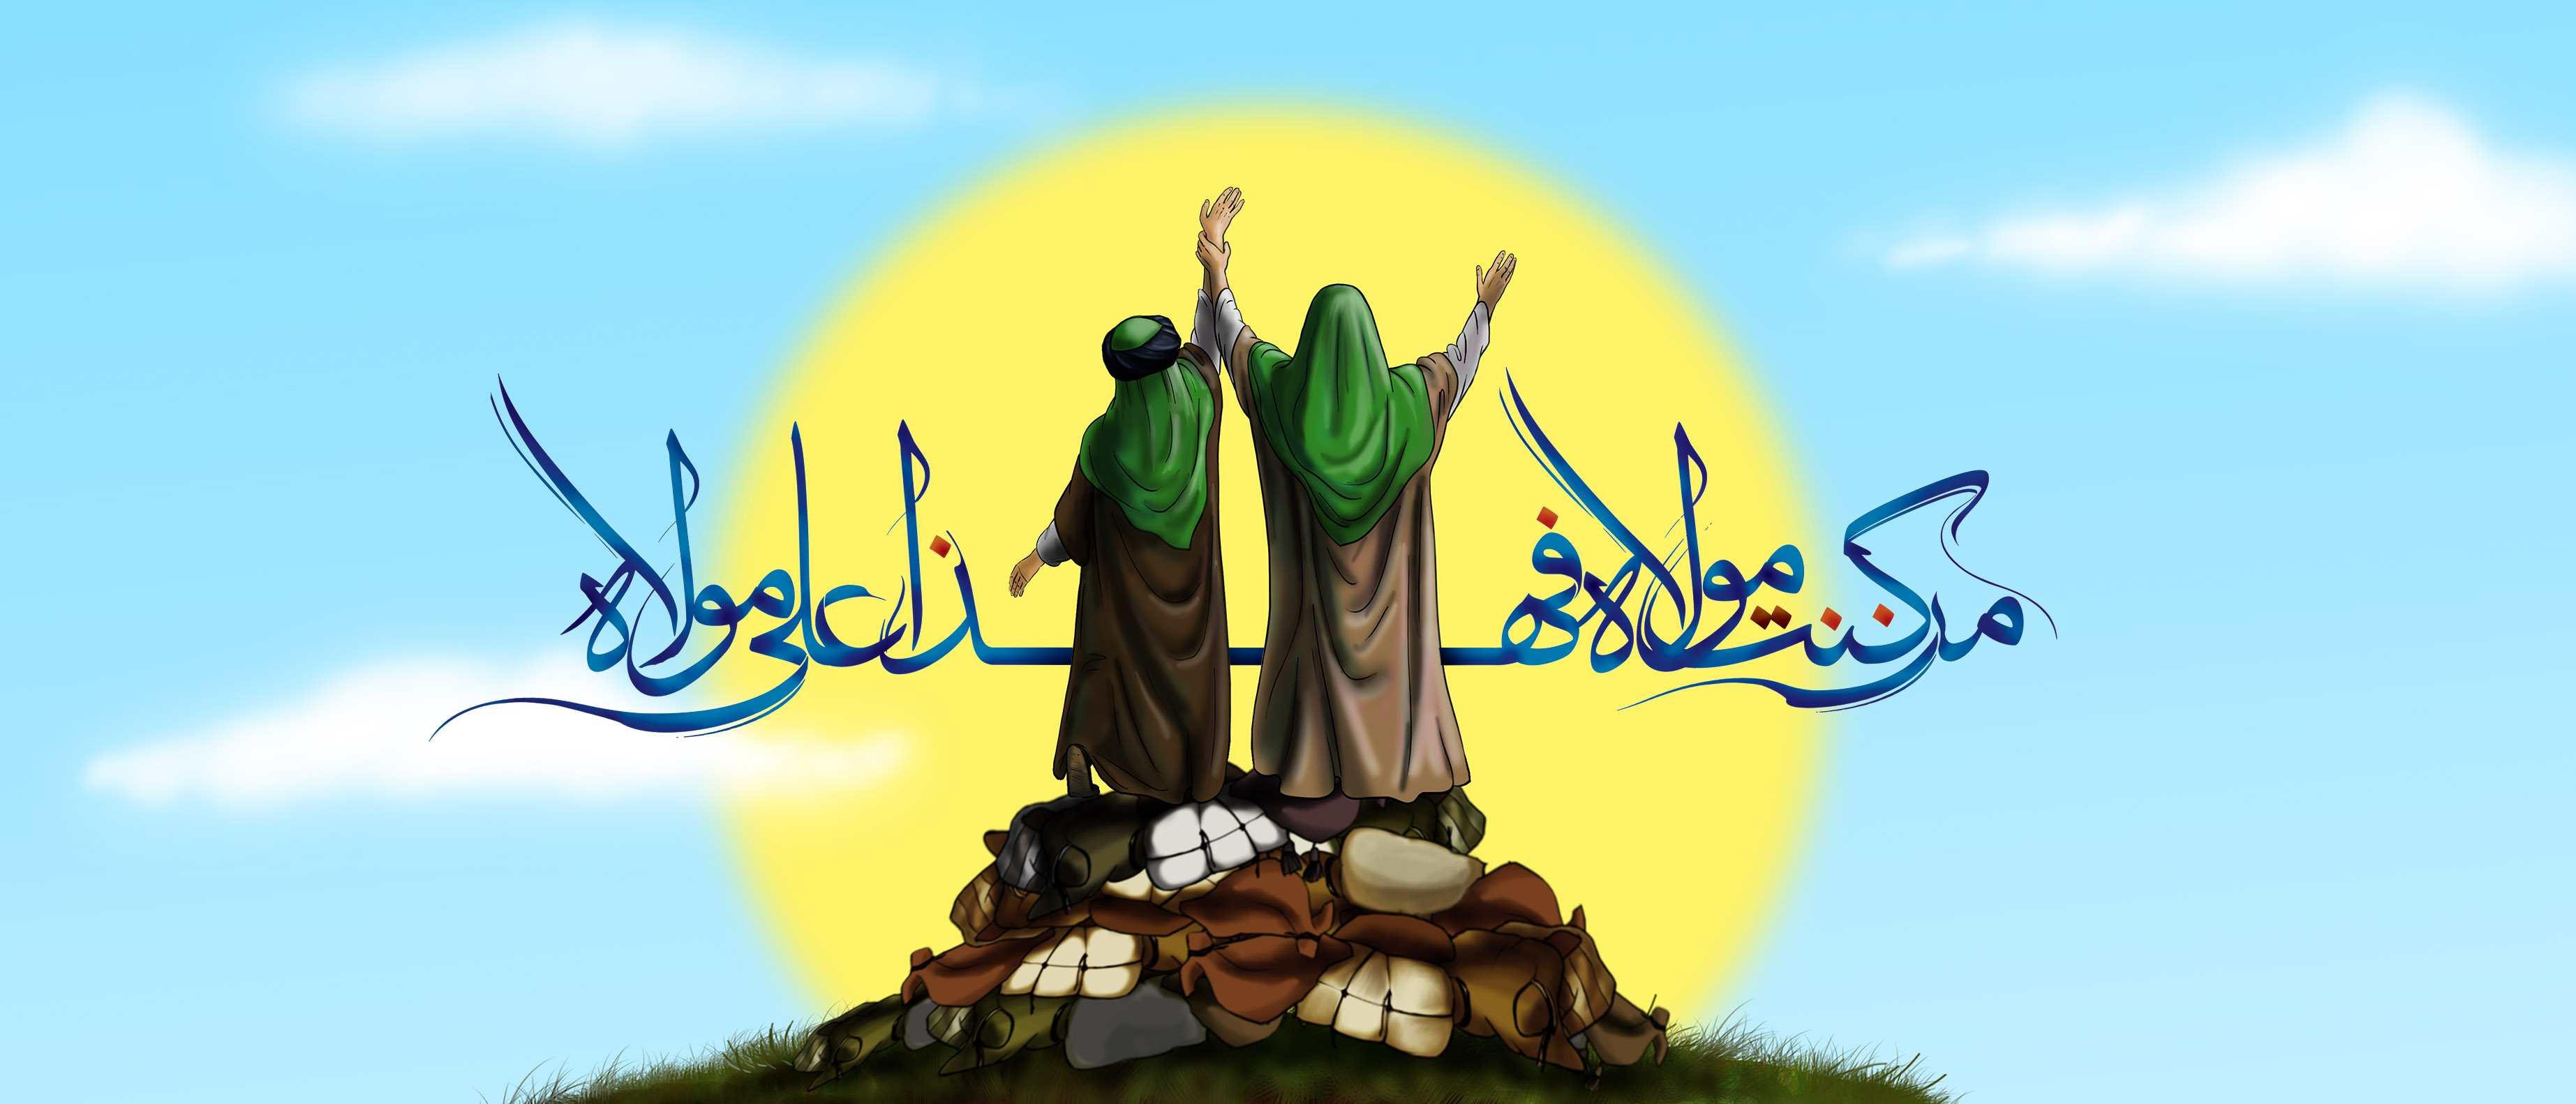 اهمیت-بزرگداشت-عید-غدیر-بخش-دوم